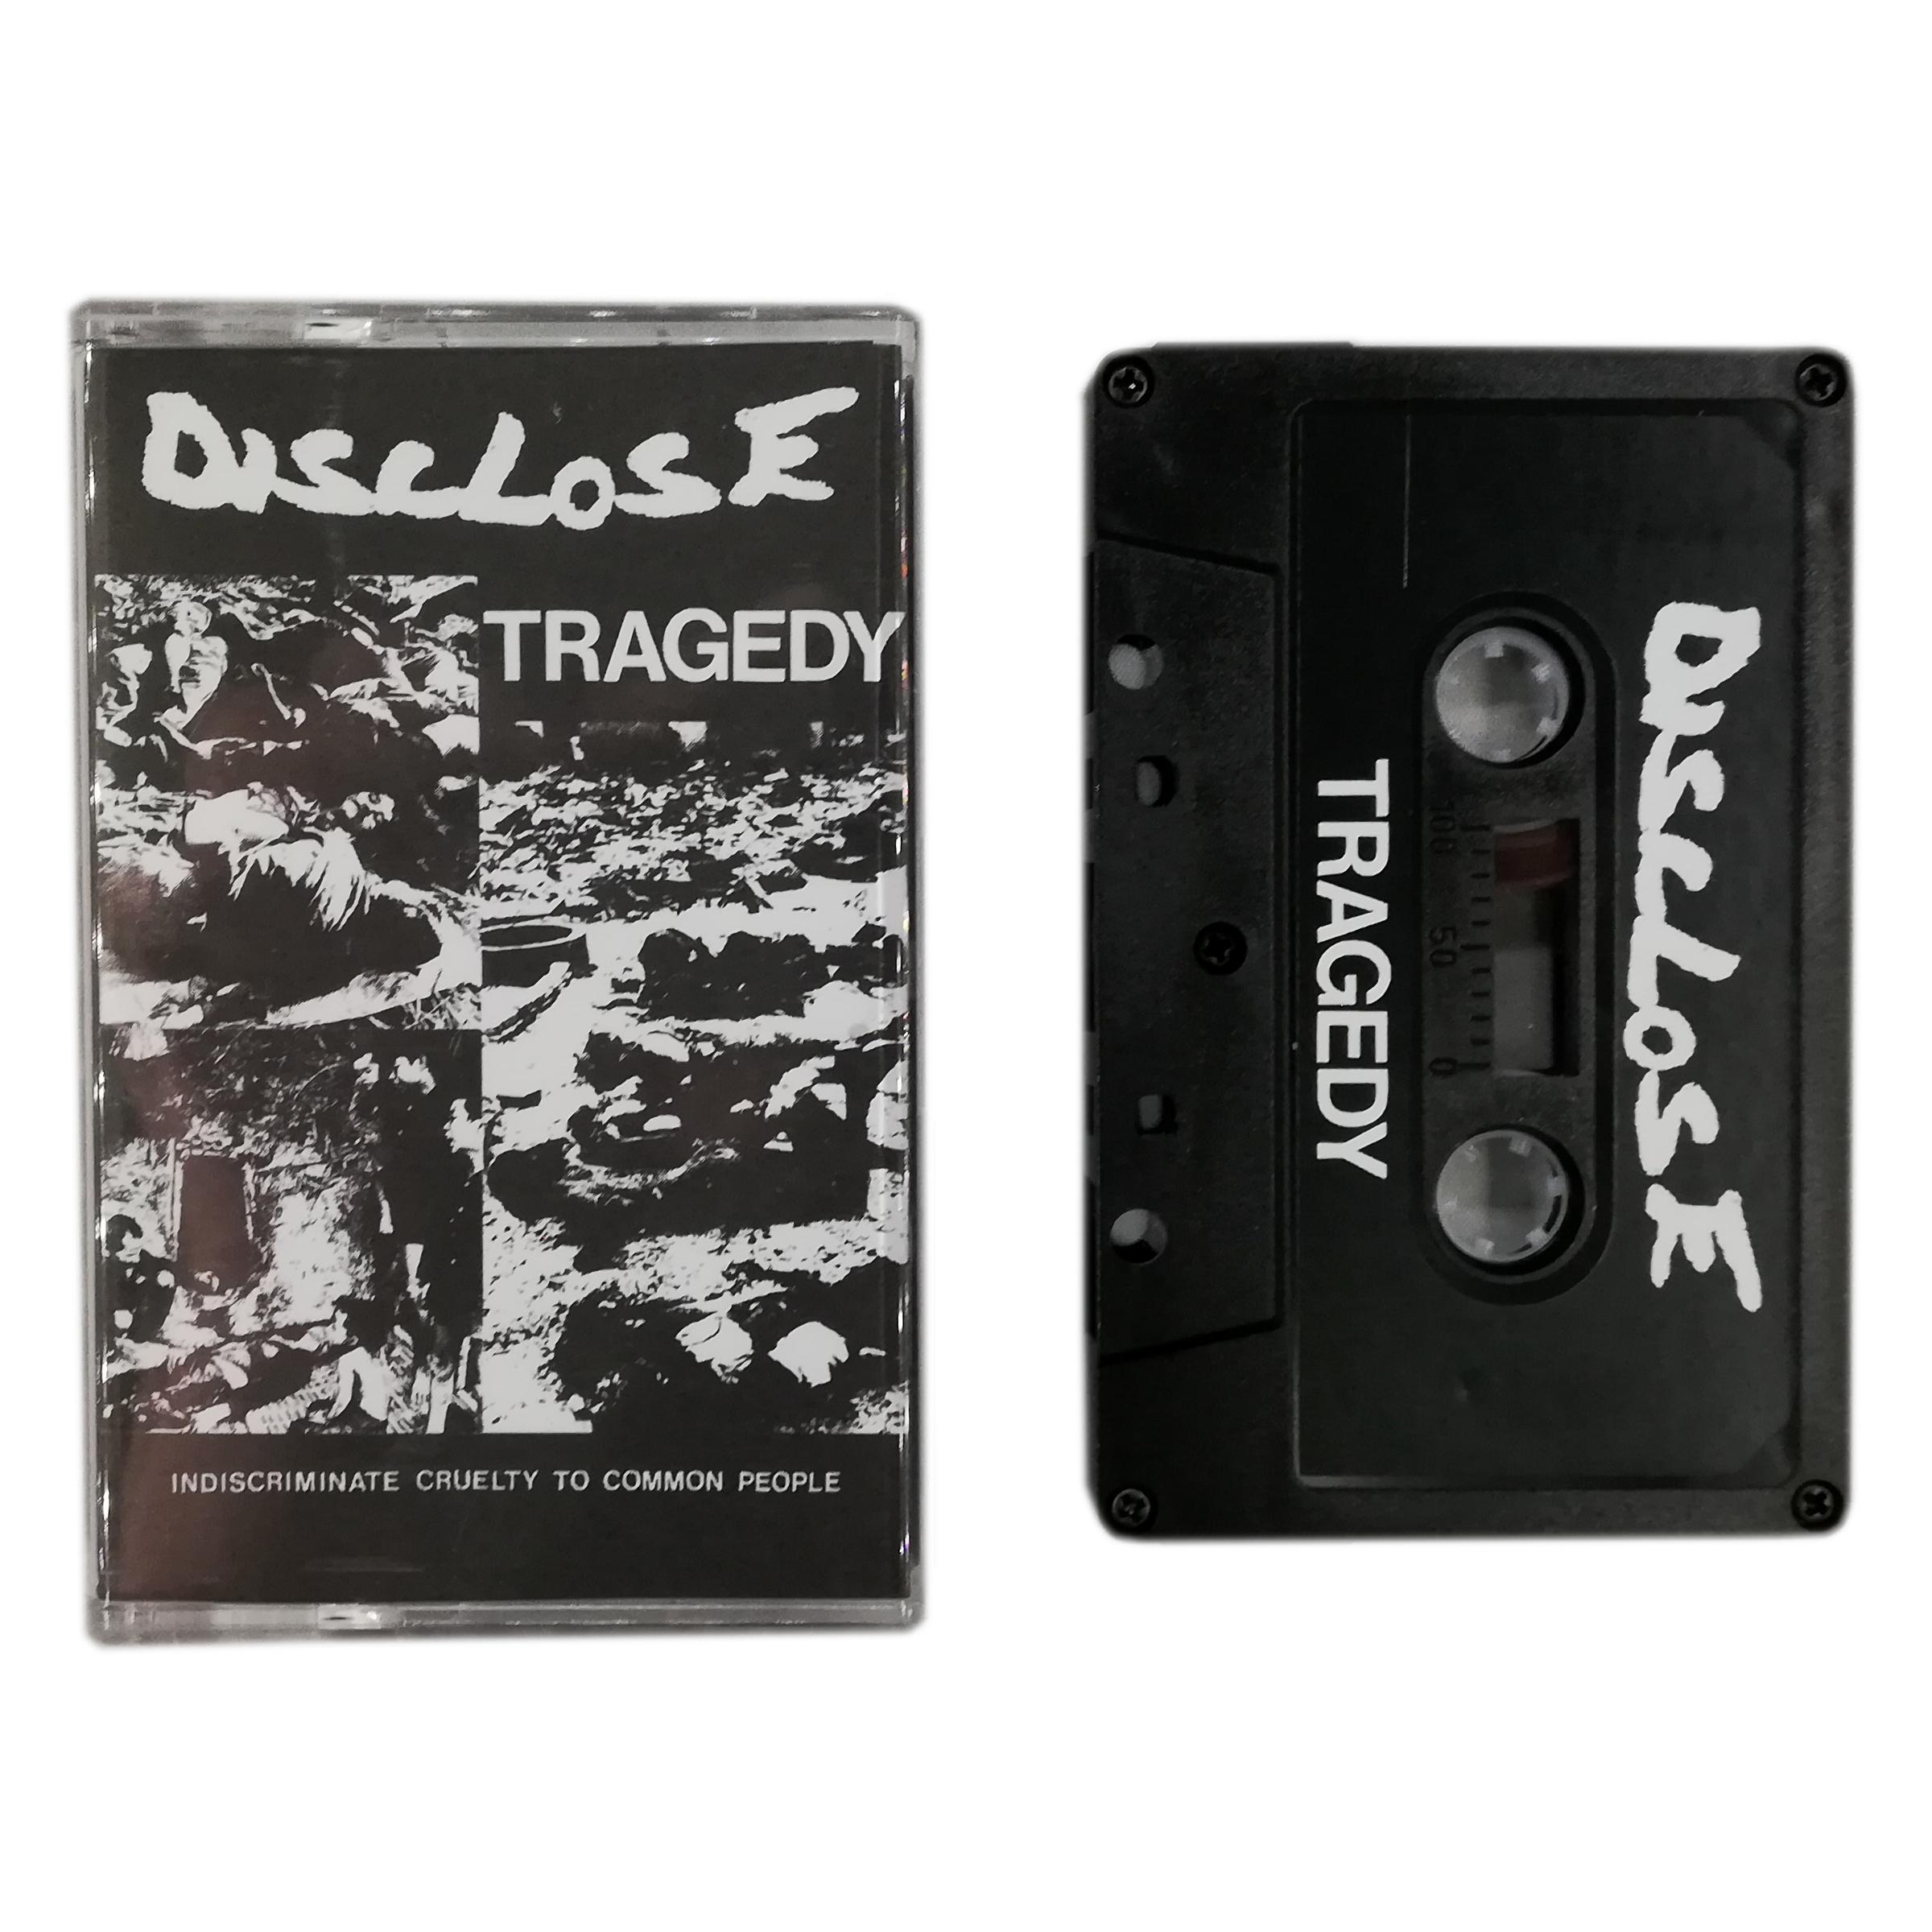 DISCLOSE-TRAGEDY.jpg